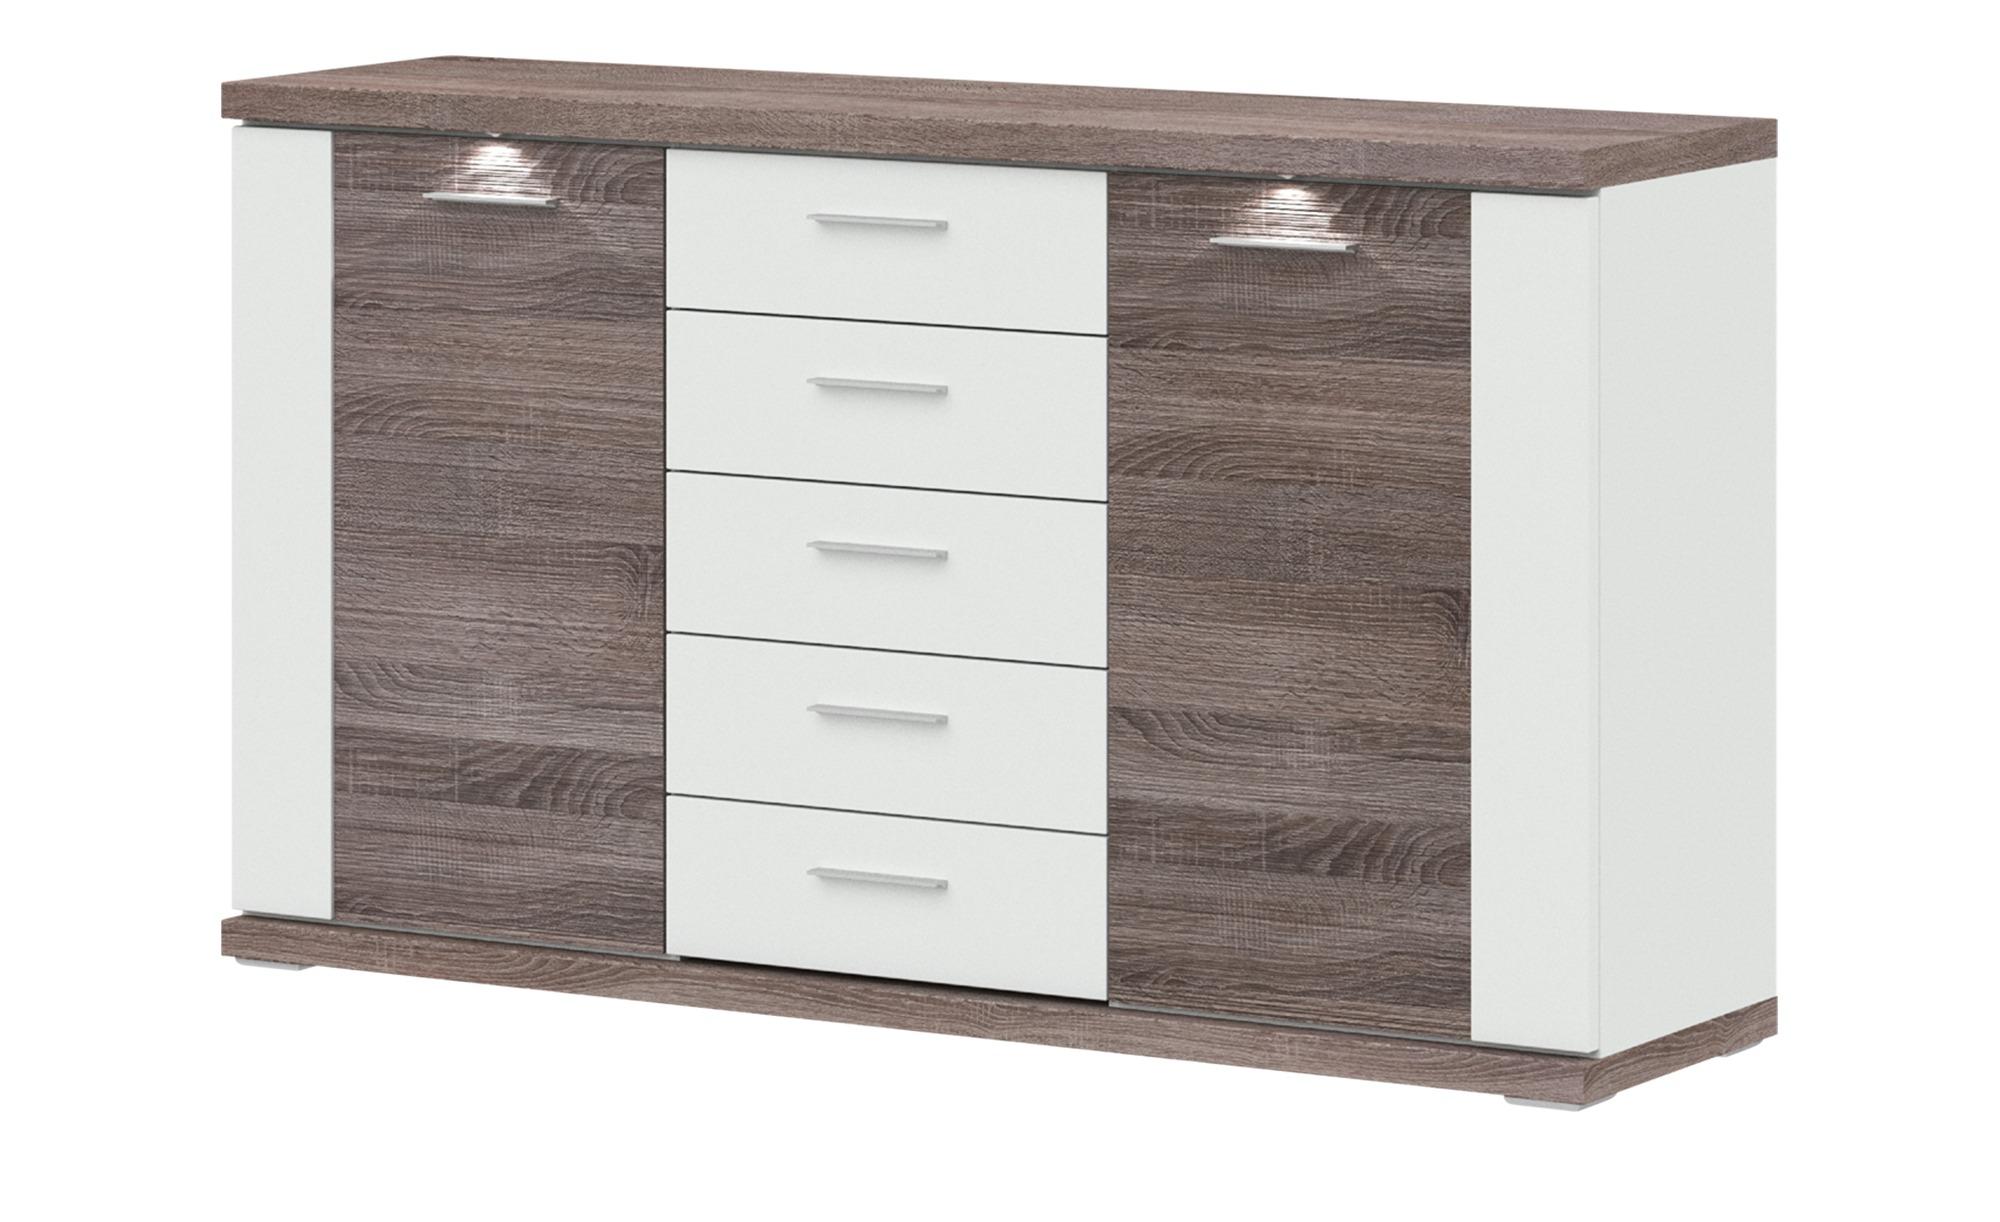 uno sideboard titan breite 156 cm h he 91 cm online. Black Bedroom Furniture Sets. Home Design Ideas